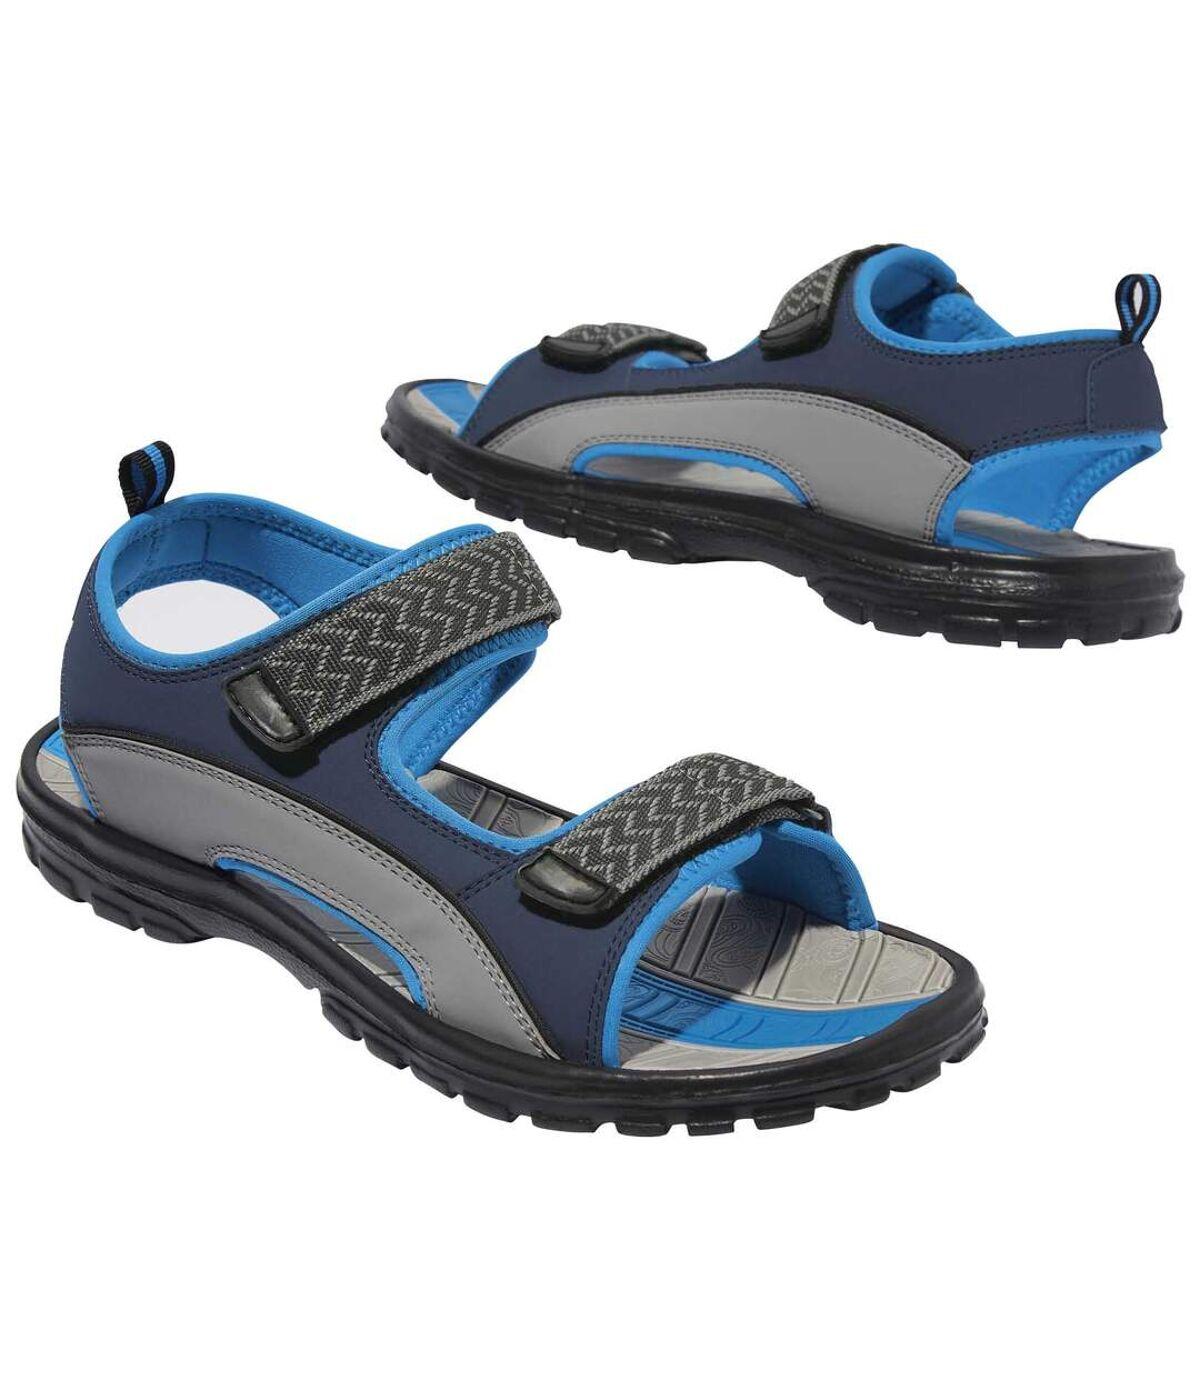 Letné sandále Holydays Atlas For Men